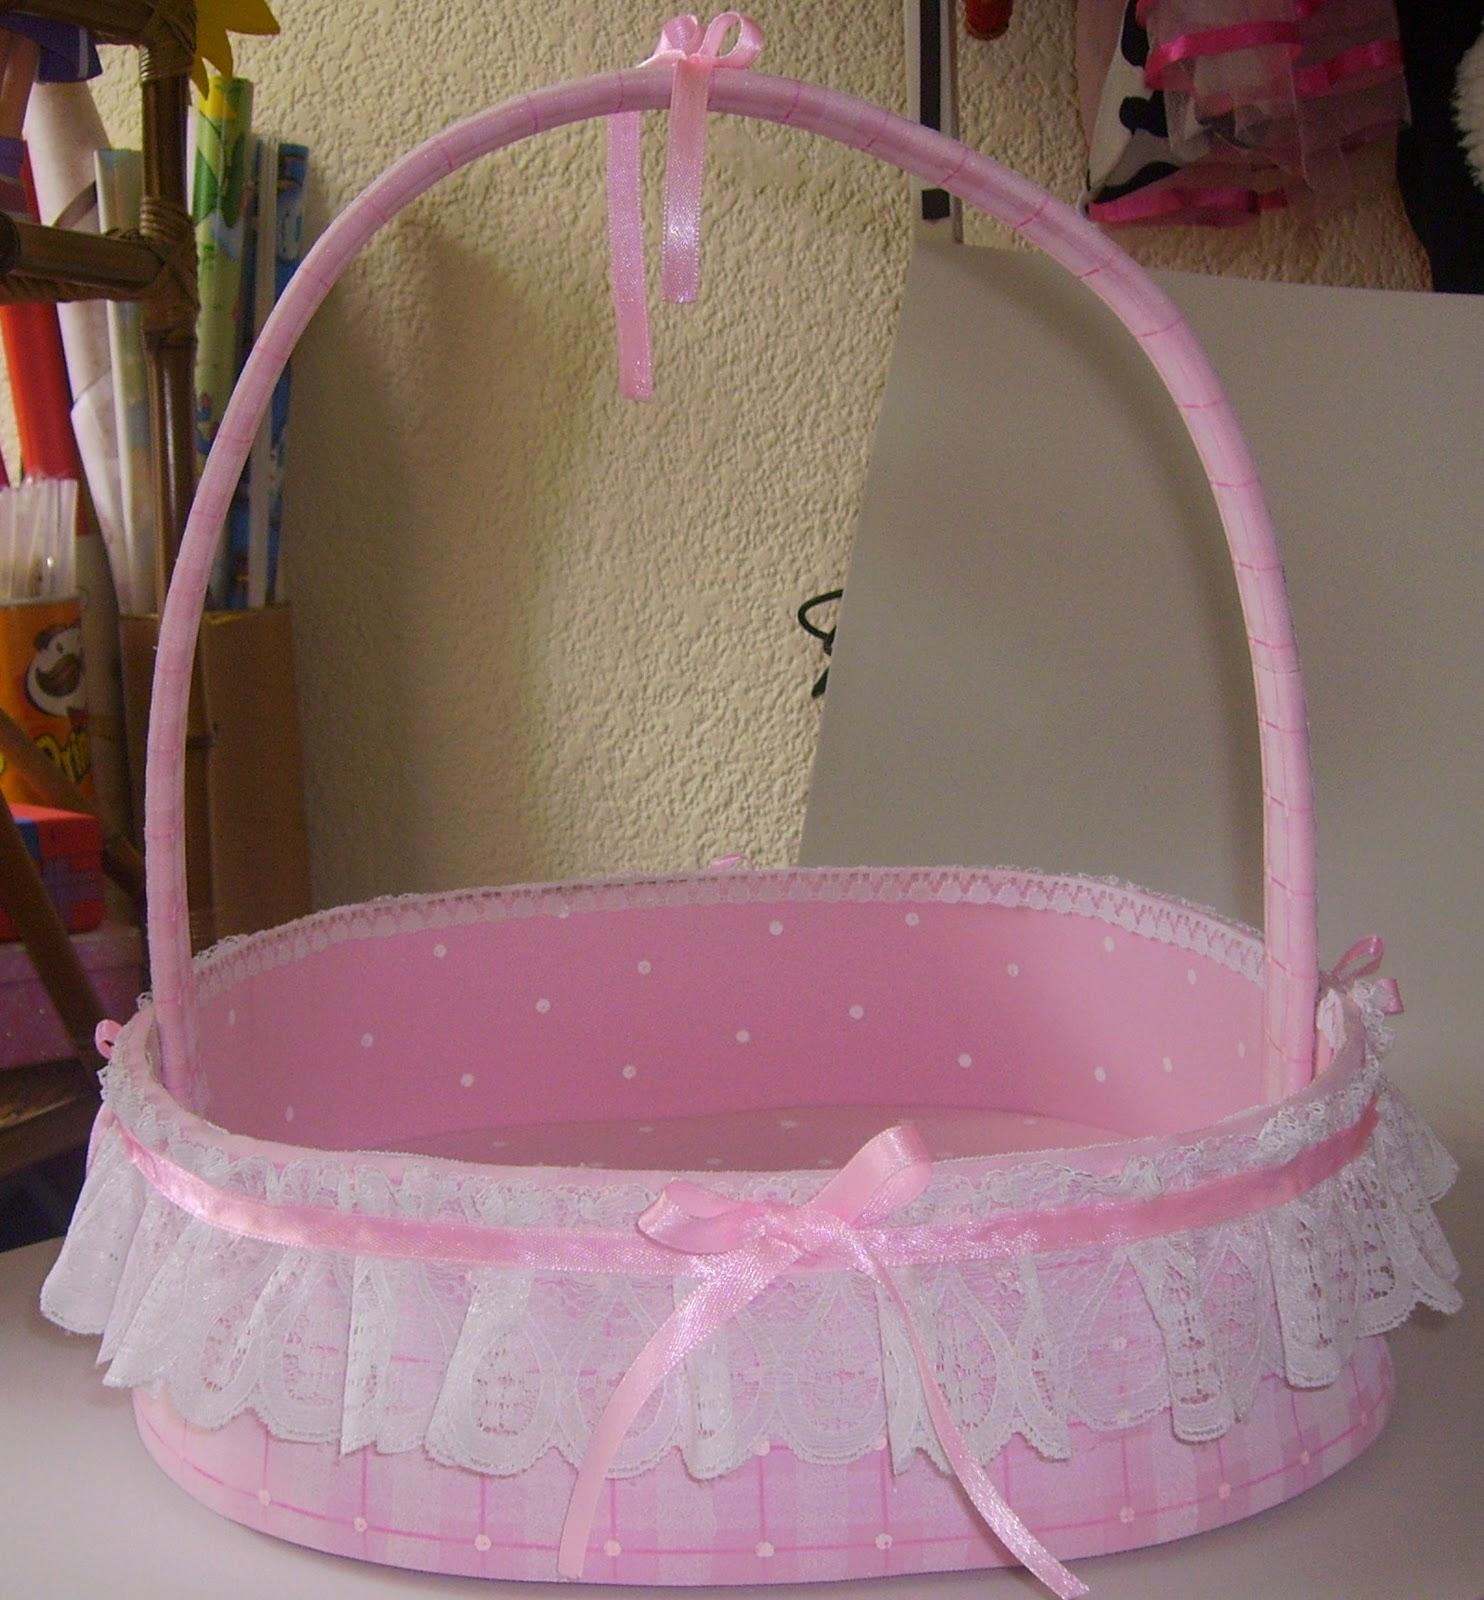 pin canastas decoradas para baby shower nio pictures on pinterest